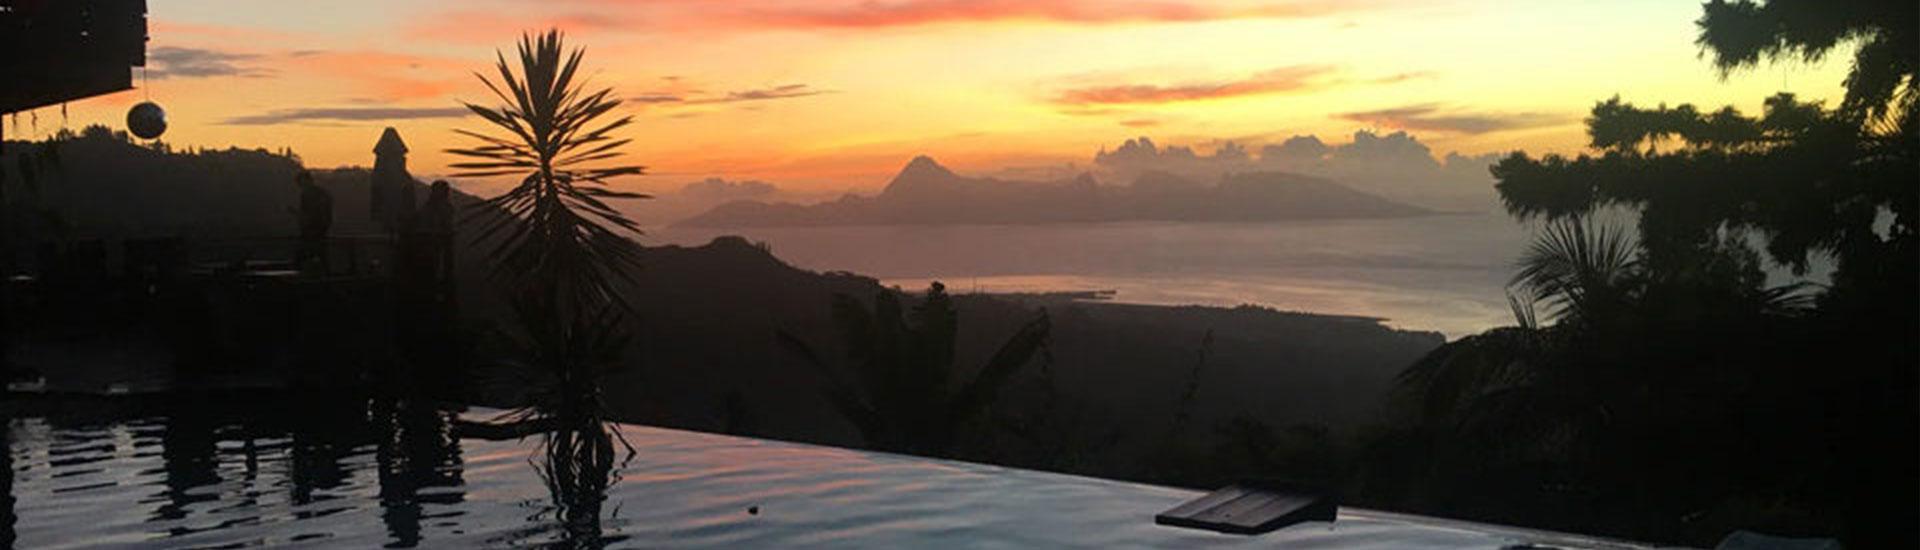 tahiti-Geektouristique-cover